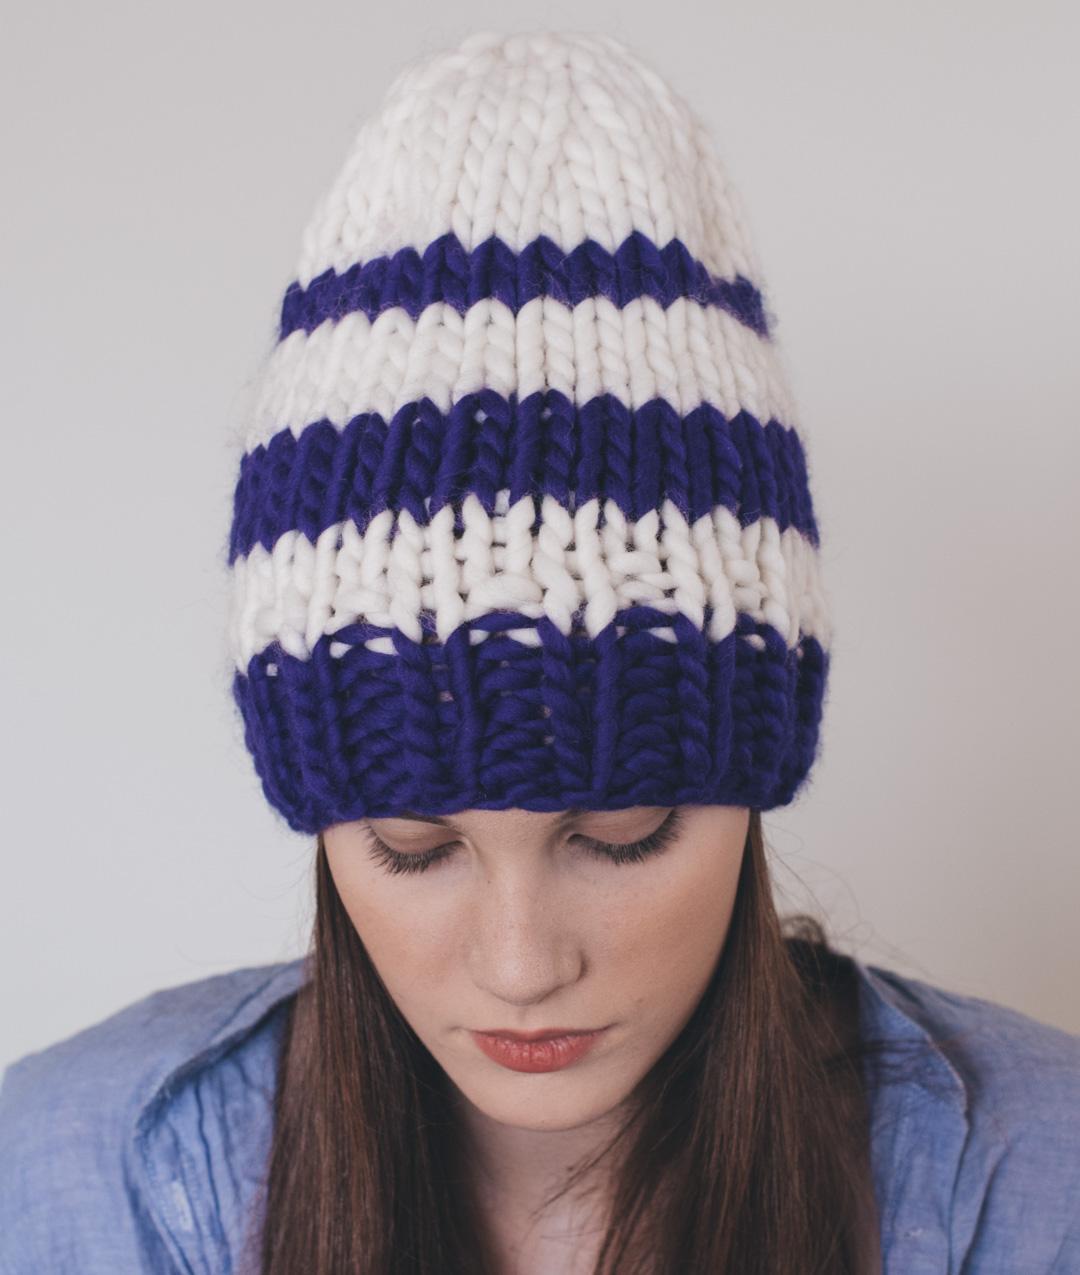 Cappelli - Lana - Striped Beanie - 1